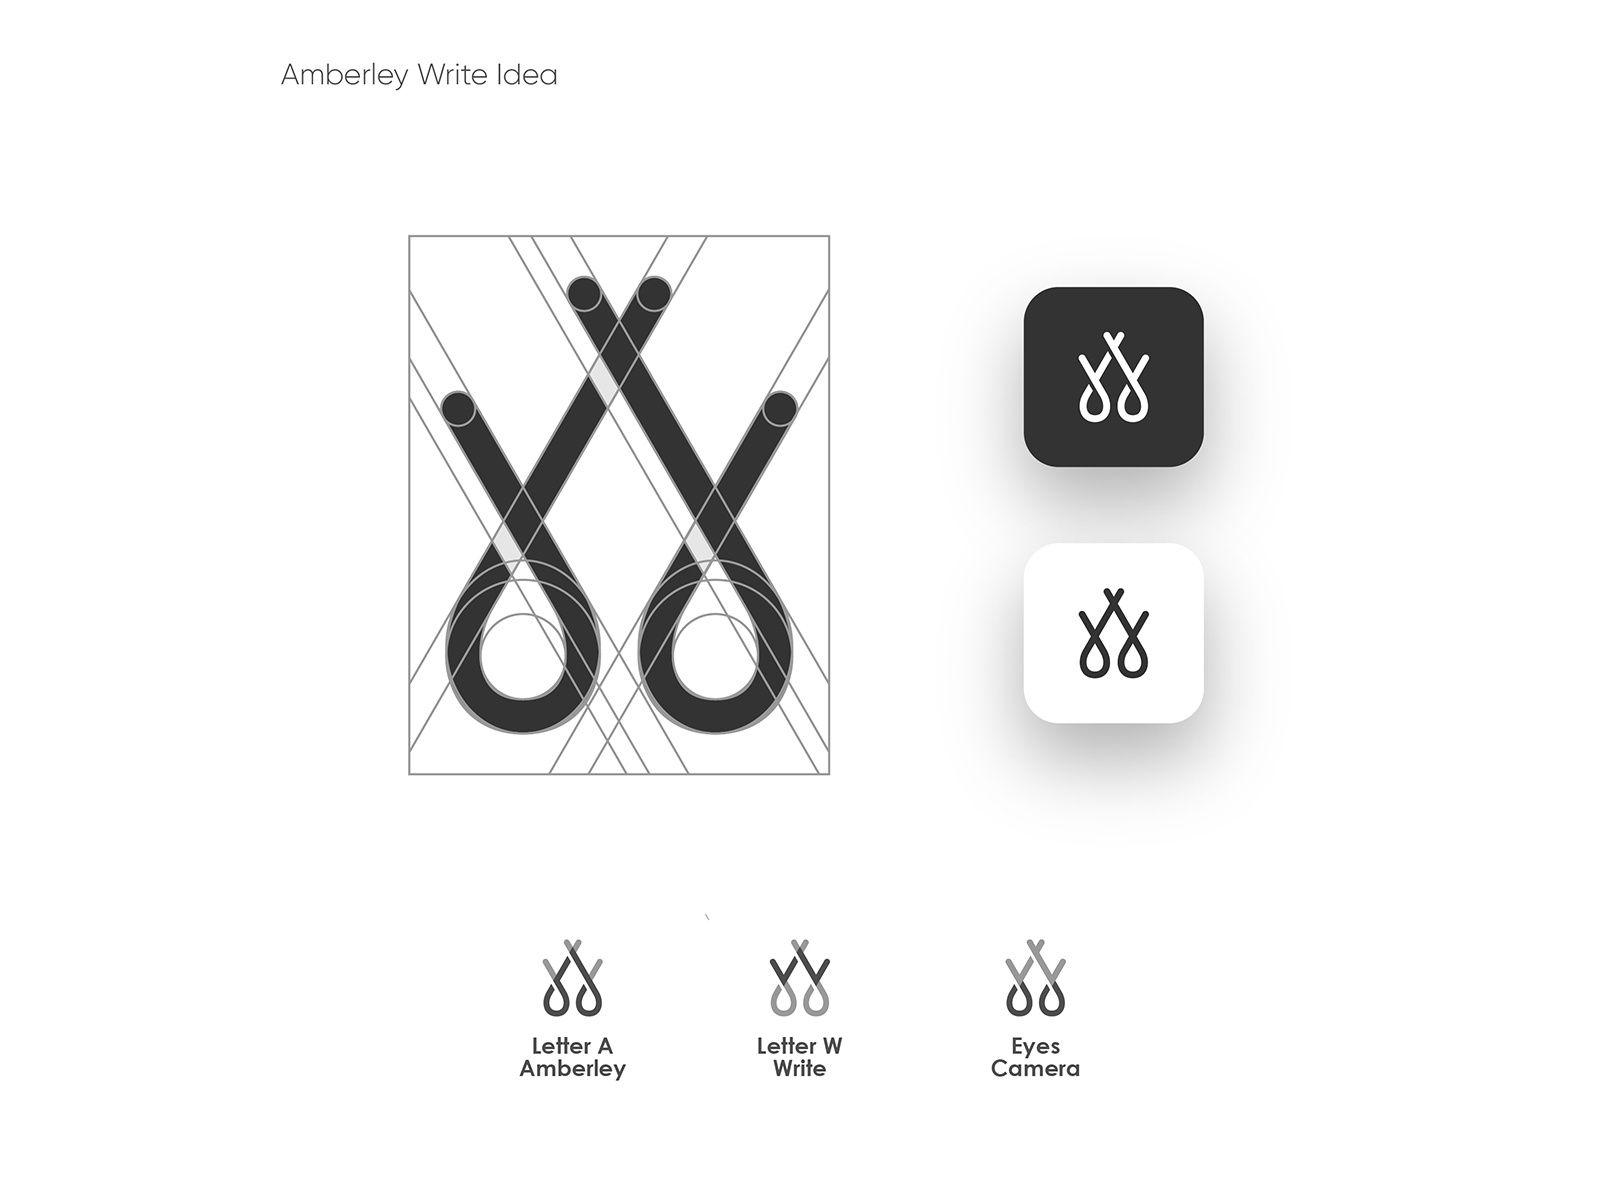 Gesa - Creative PowerPoint   Template, Desain